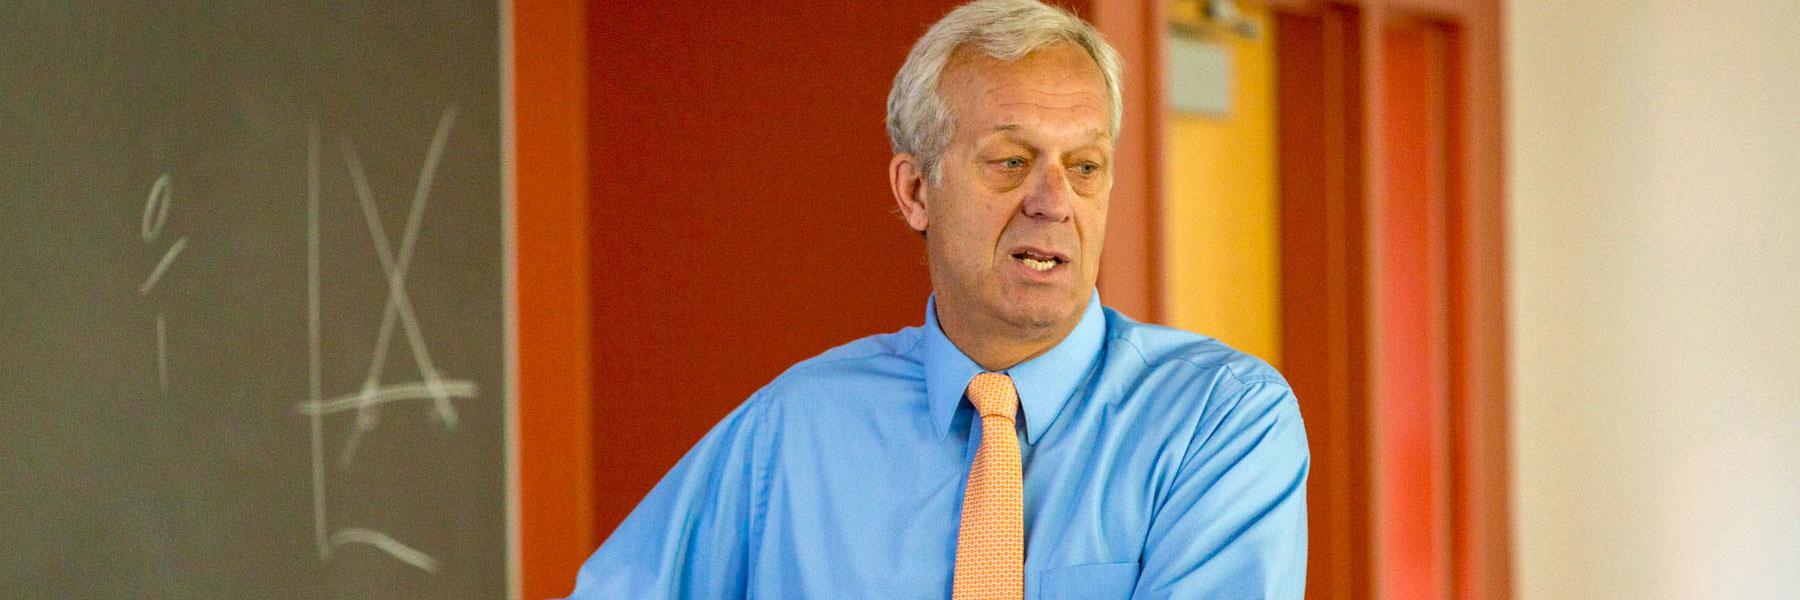 Professor Dean Shoop, of the BLC Business Administration Department, teaches an economics class.